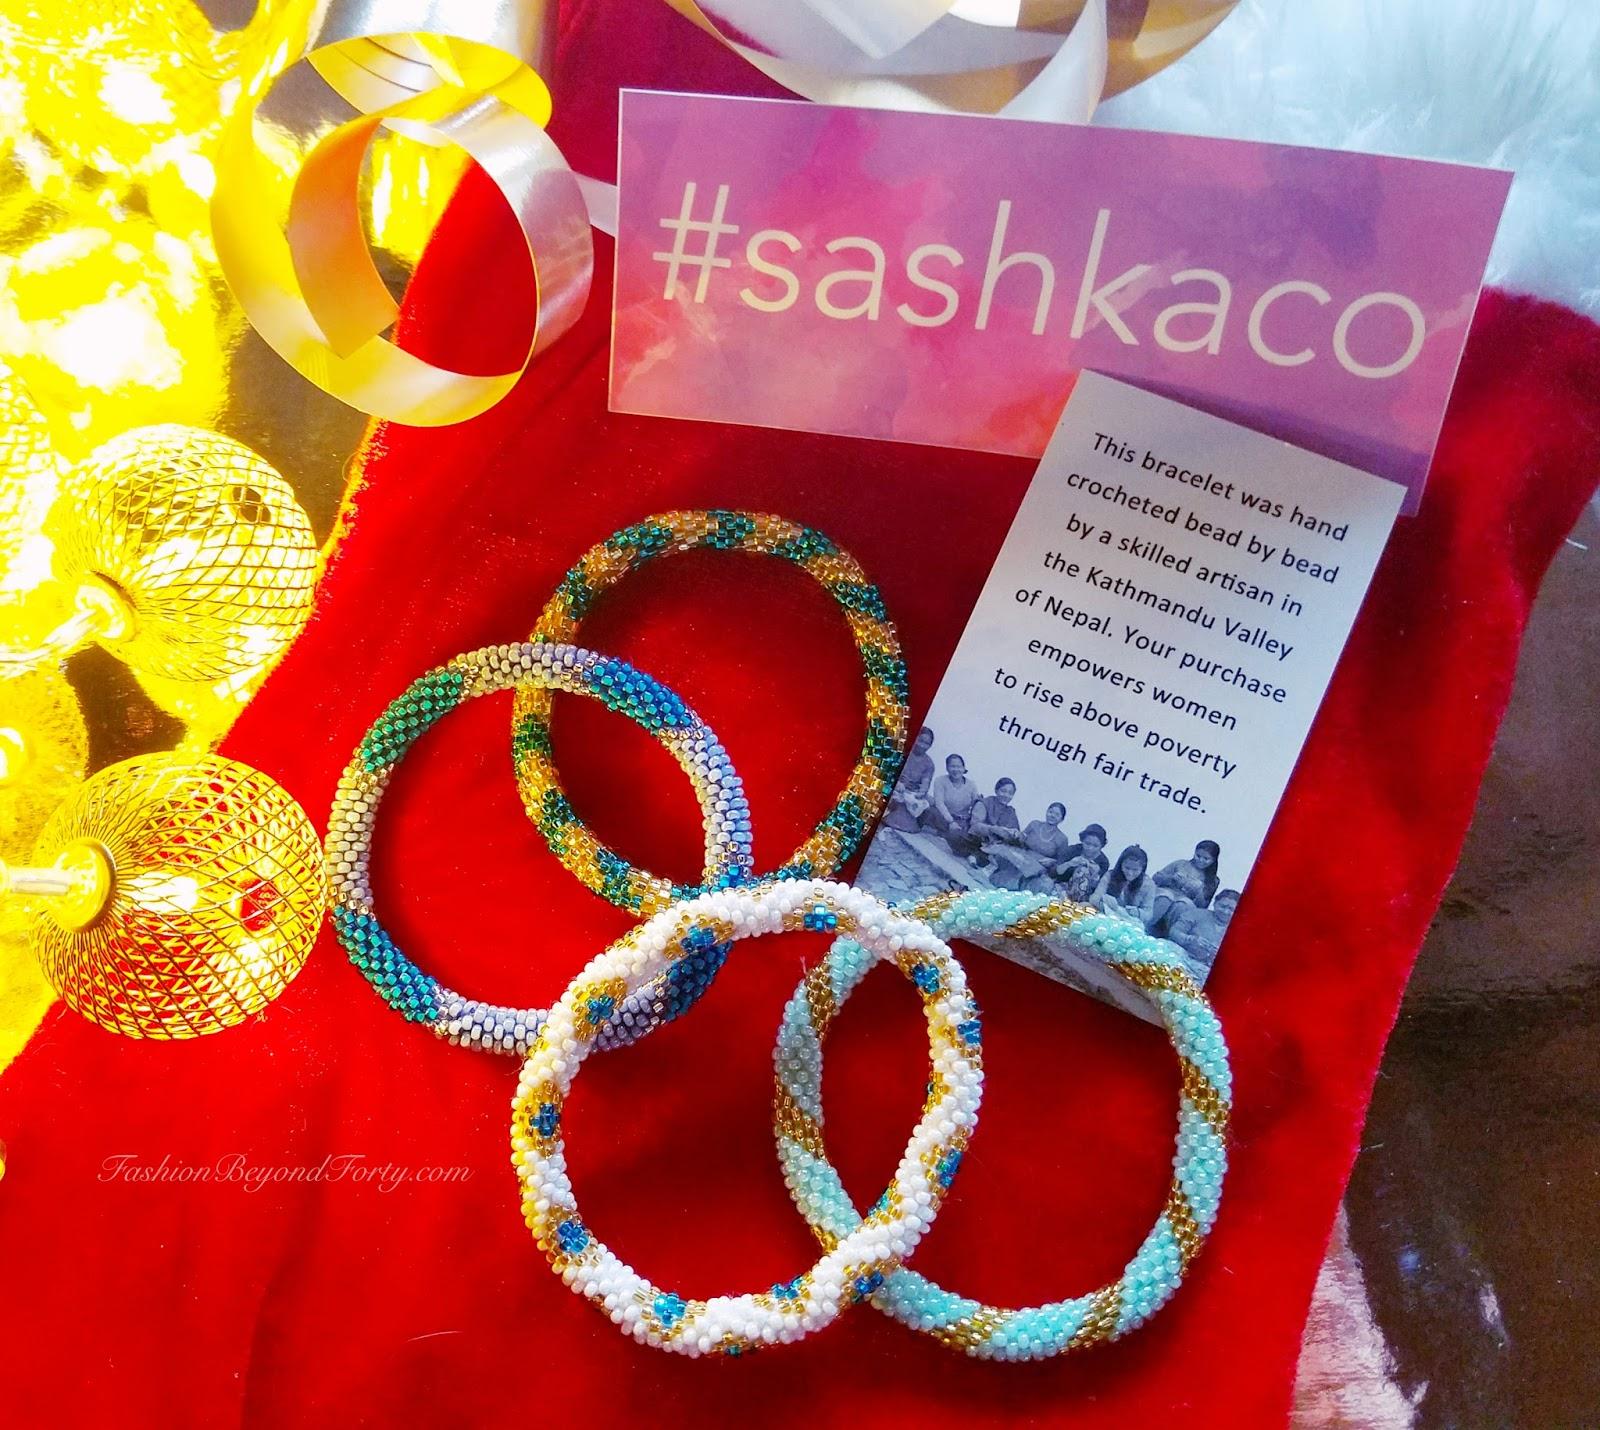 Black Friday Deal SashkaCo. Seed Bead Bracelets Buy 3 Get 5 Free!